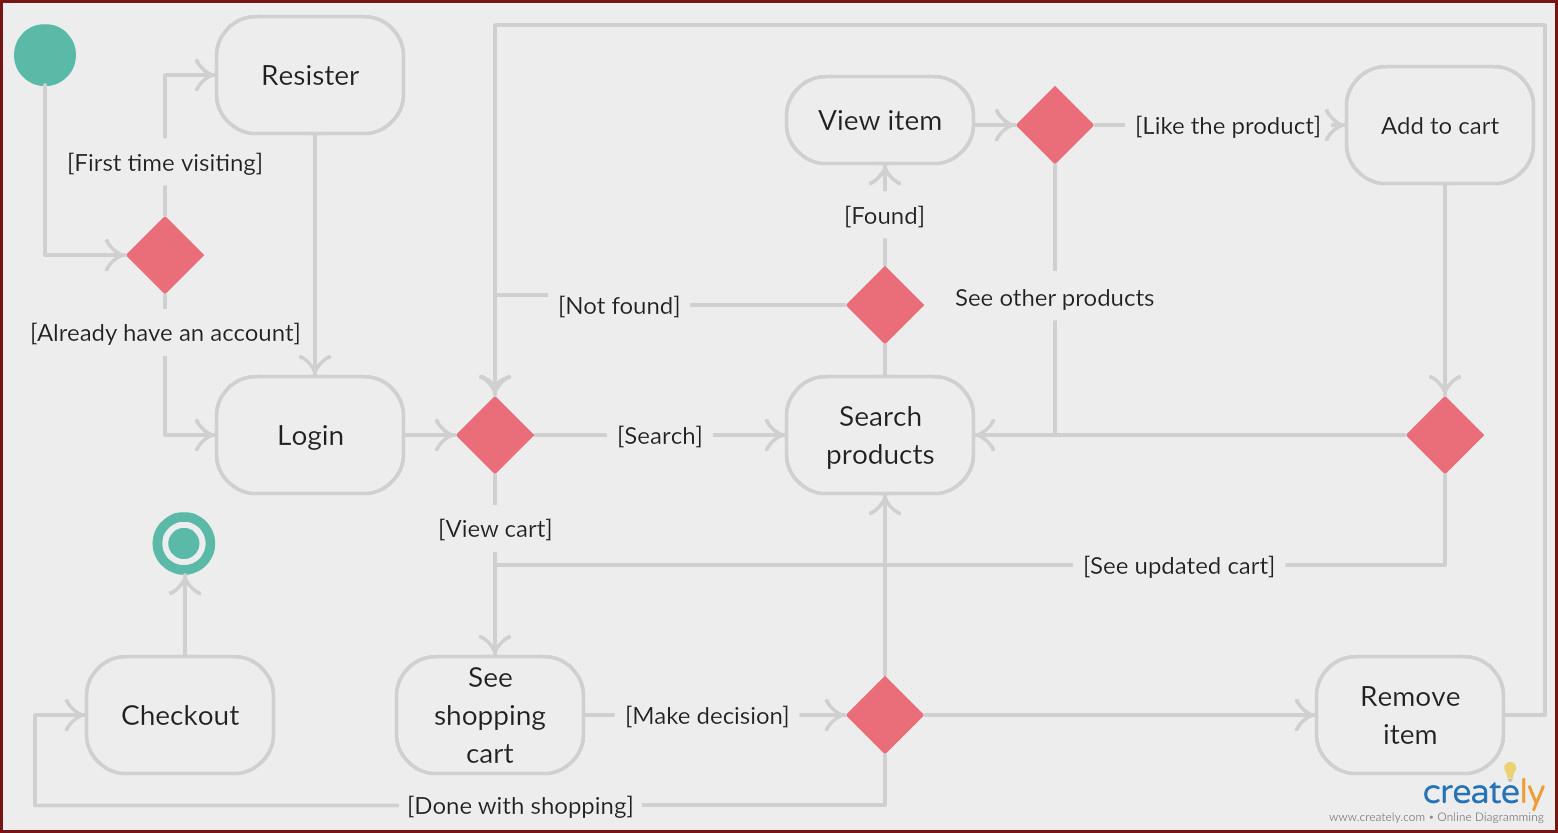 Create Erd Diagram In Visio At Manuals Library intended for Er Diagram Visio 2017